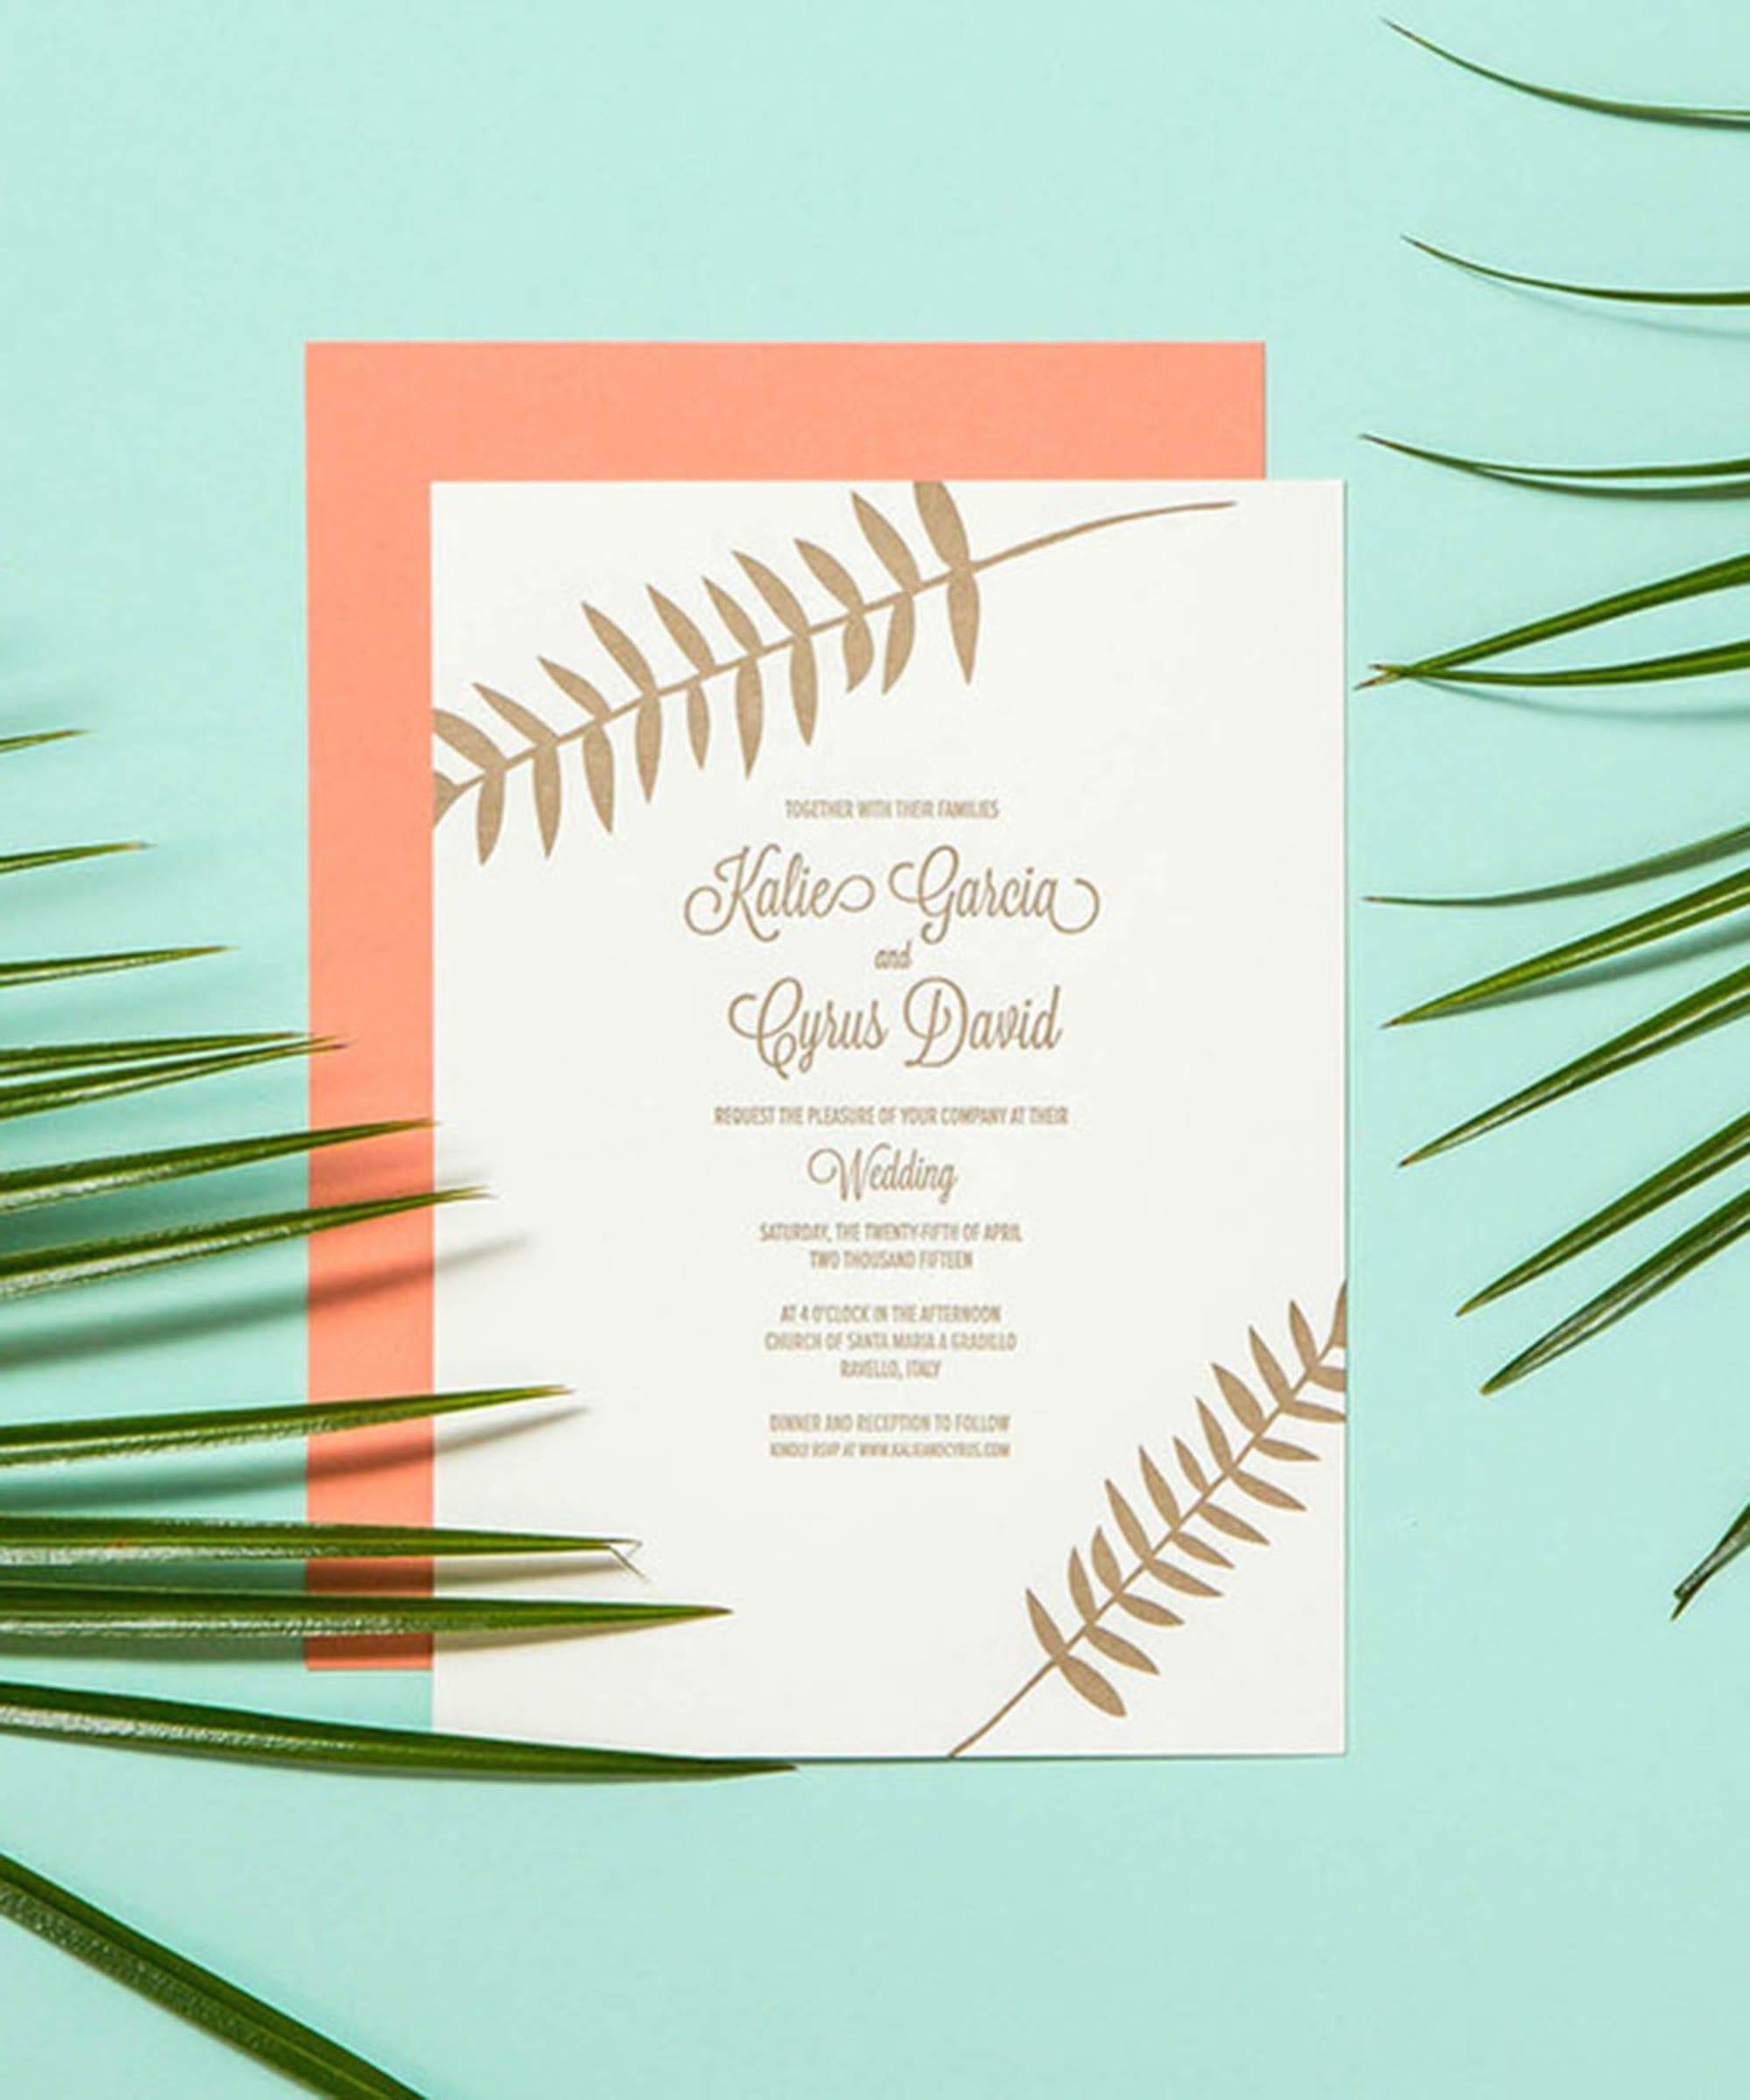 Fullsize Of Wedding Invitation Ideas